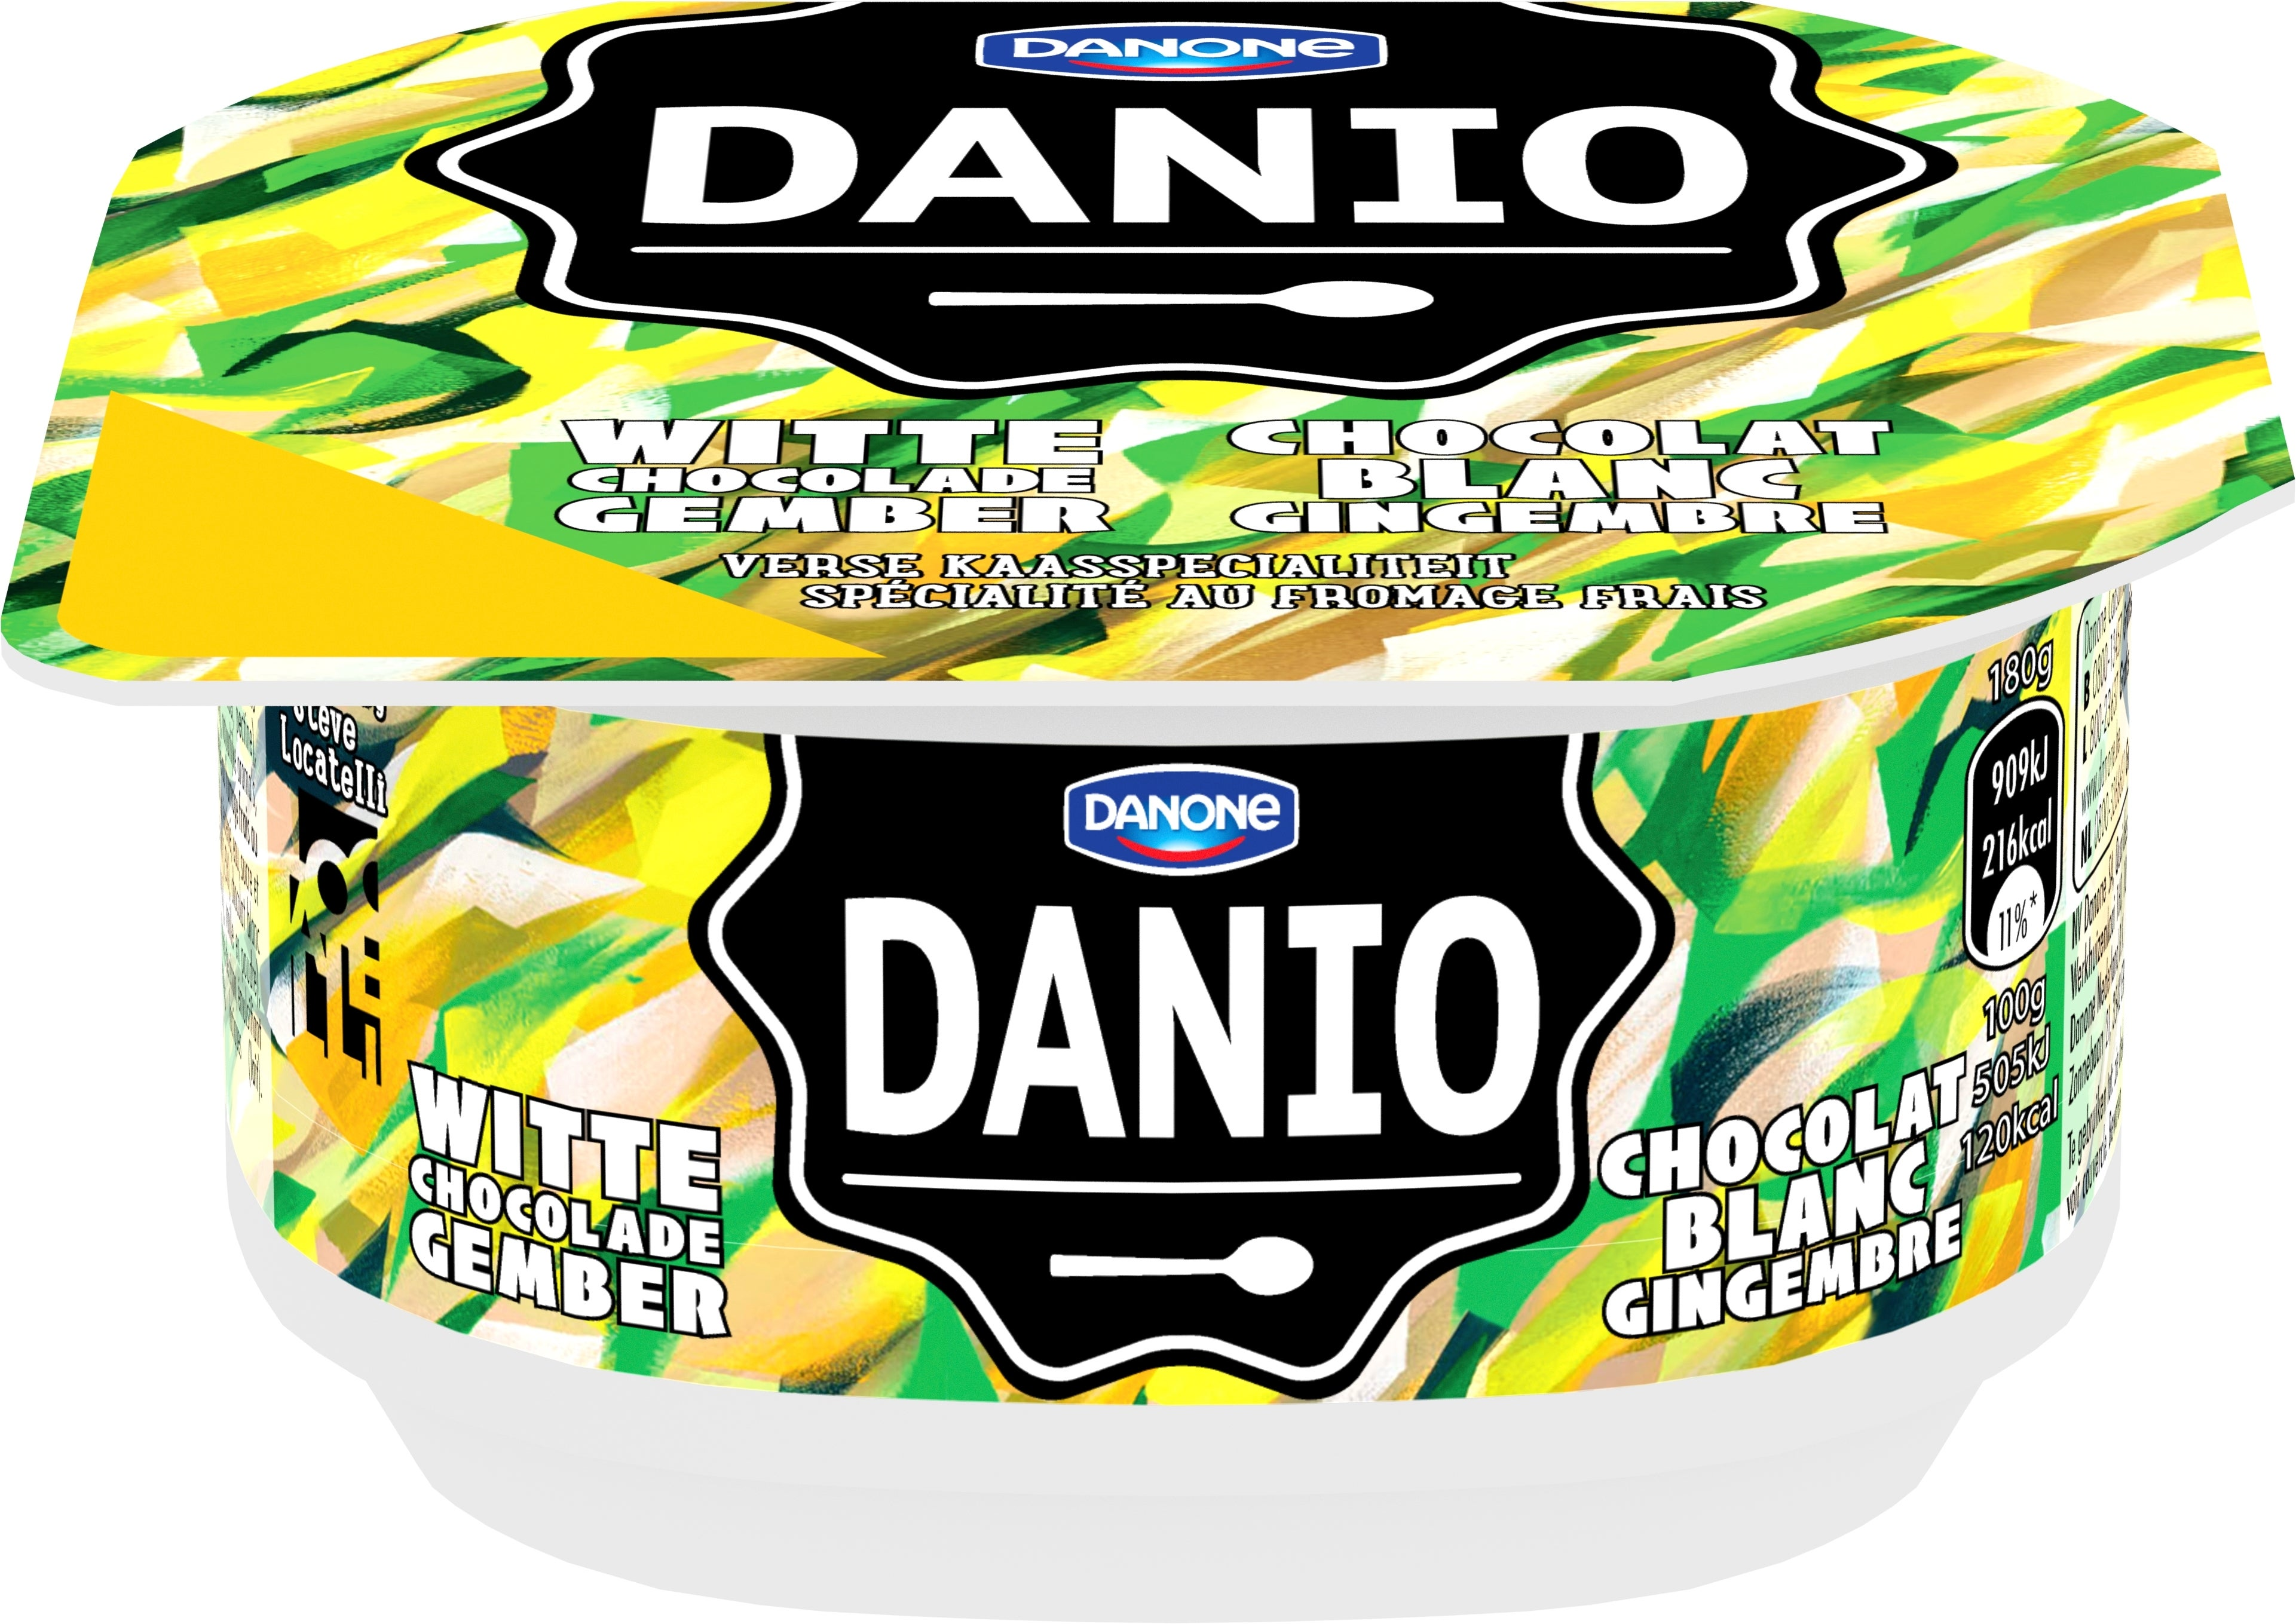 Danio Witte Chocolade Gember 180g